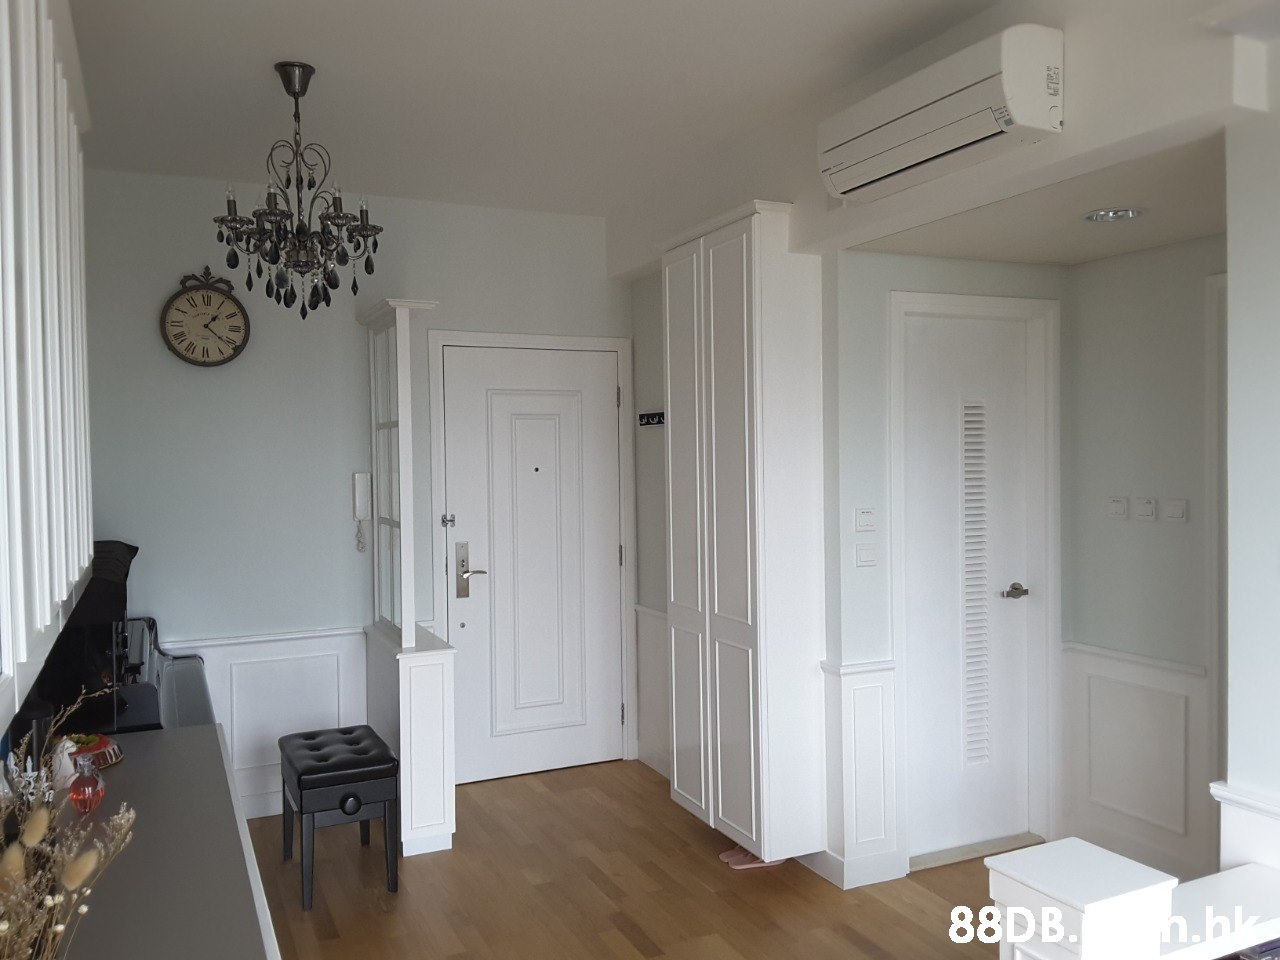 88DB. n.hle  Room,Property,Floor,Wall,Wood flooring